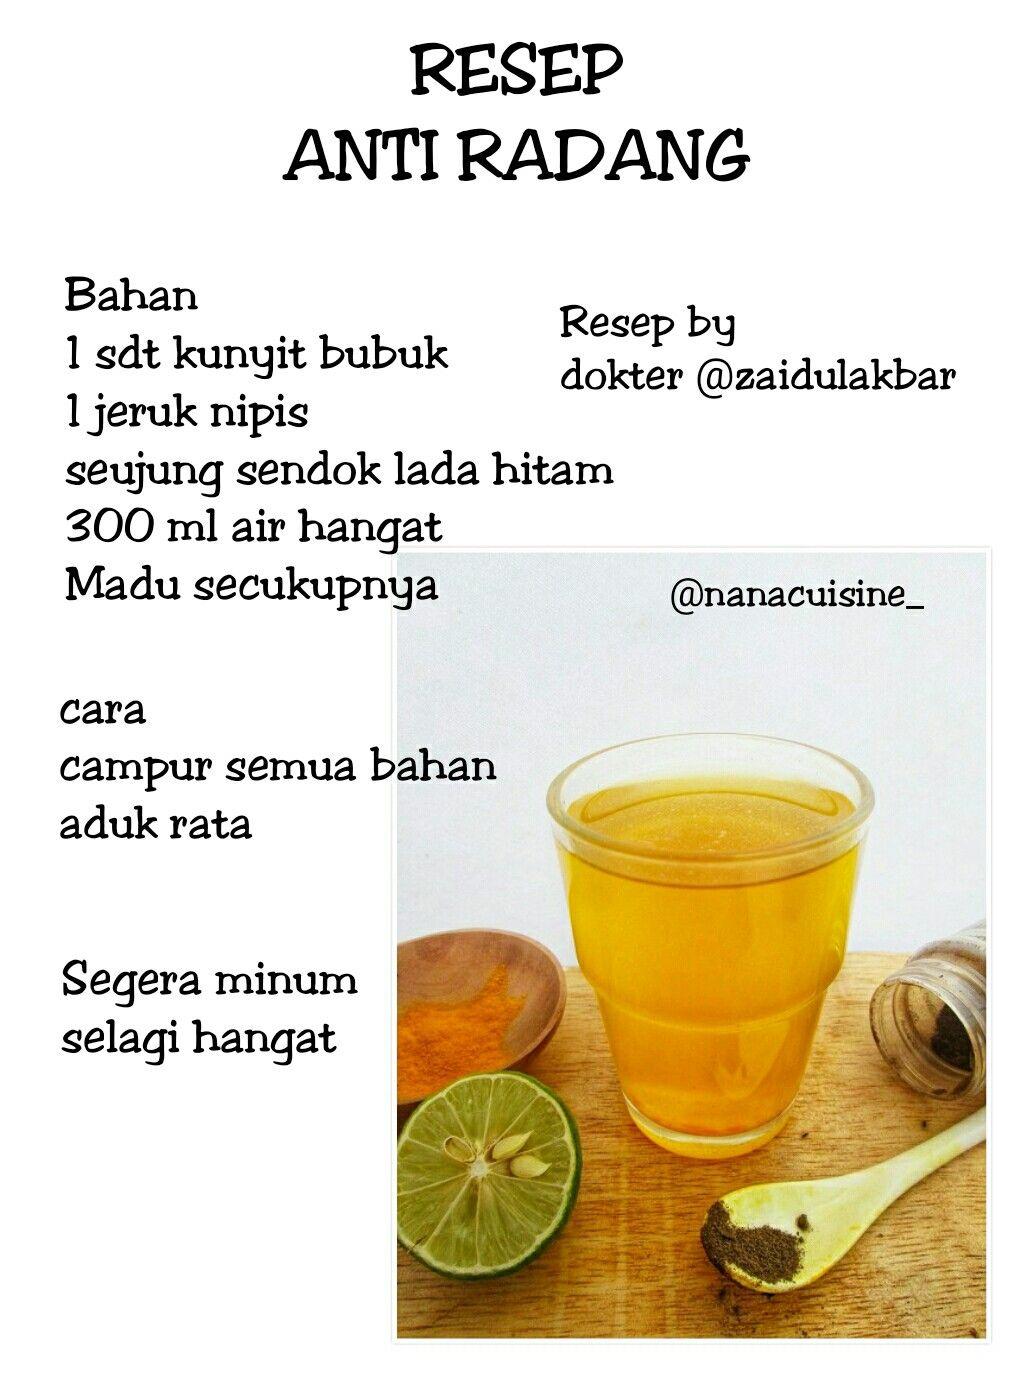 Resep Minuman Tradisional Obat Alami Resep Diet Resep Diet Sehat